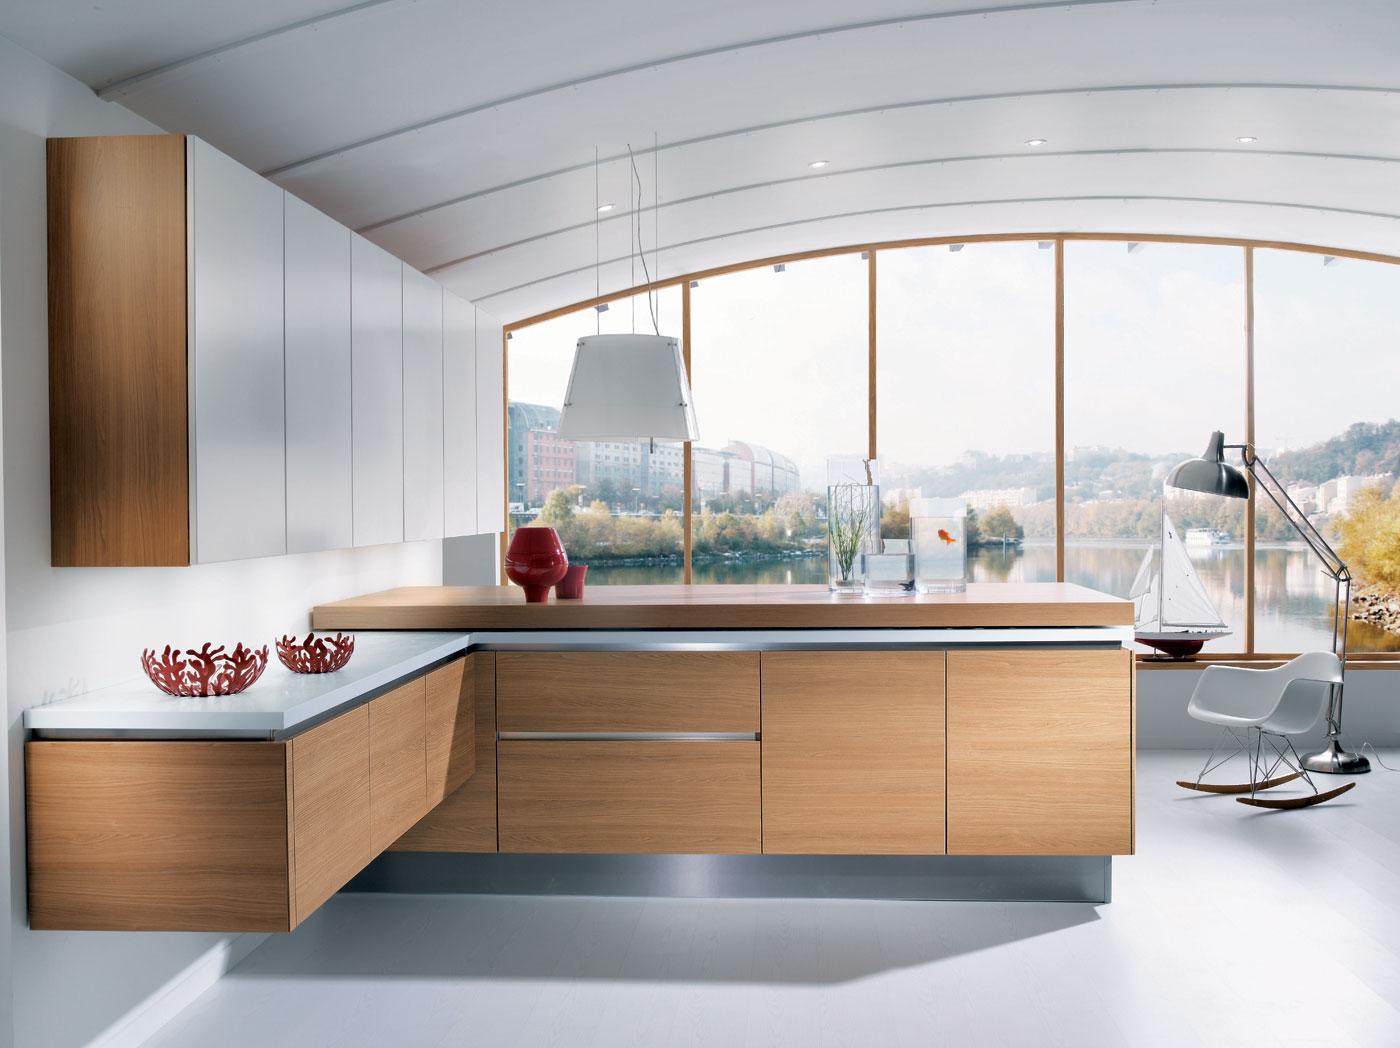 cuisine galeo cerisier perene lyon. Black Bedroom Furniture Sets. Home Design Ideas